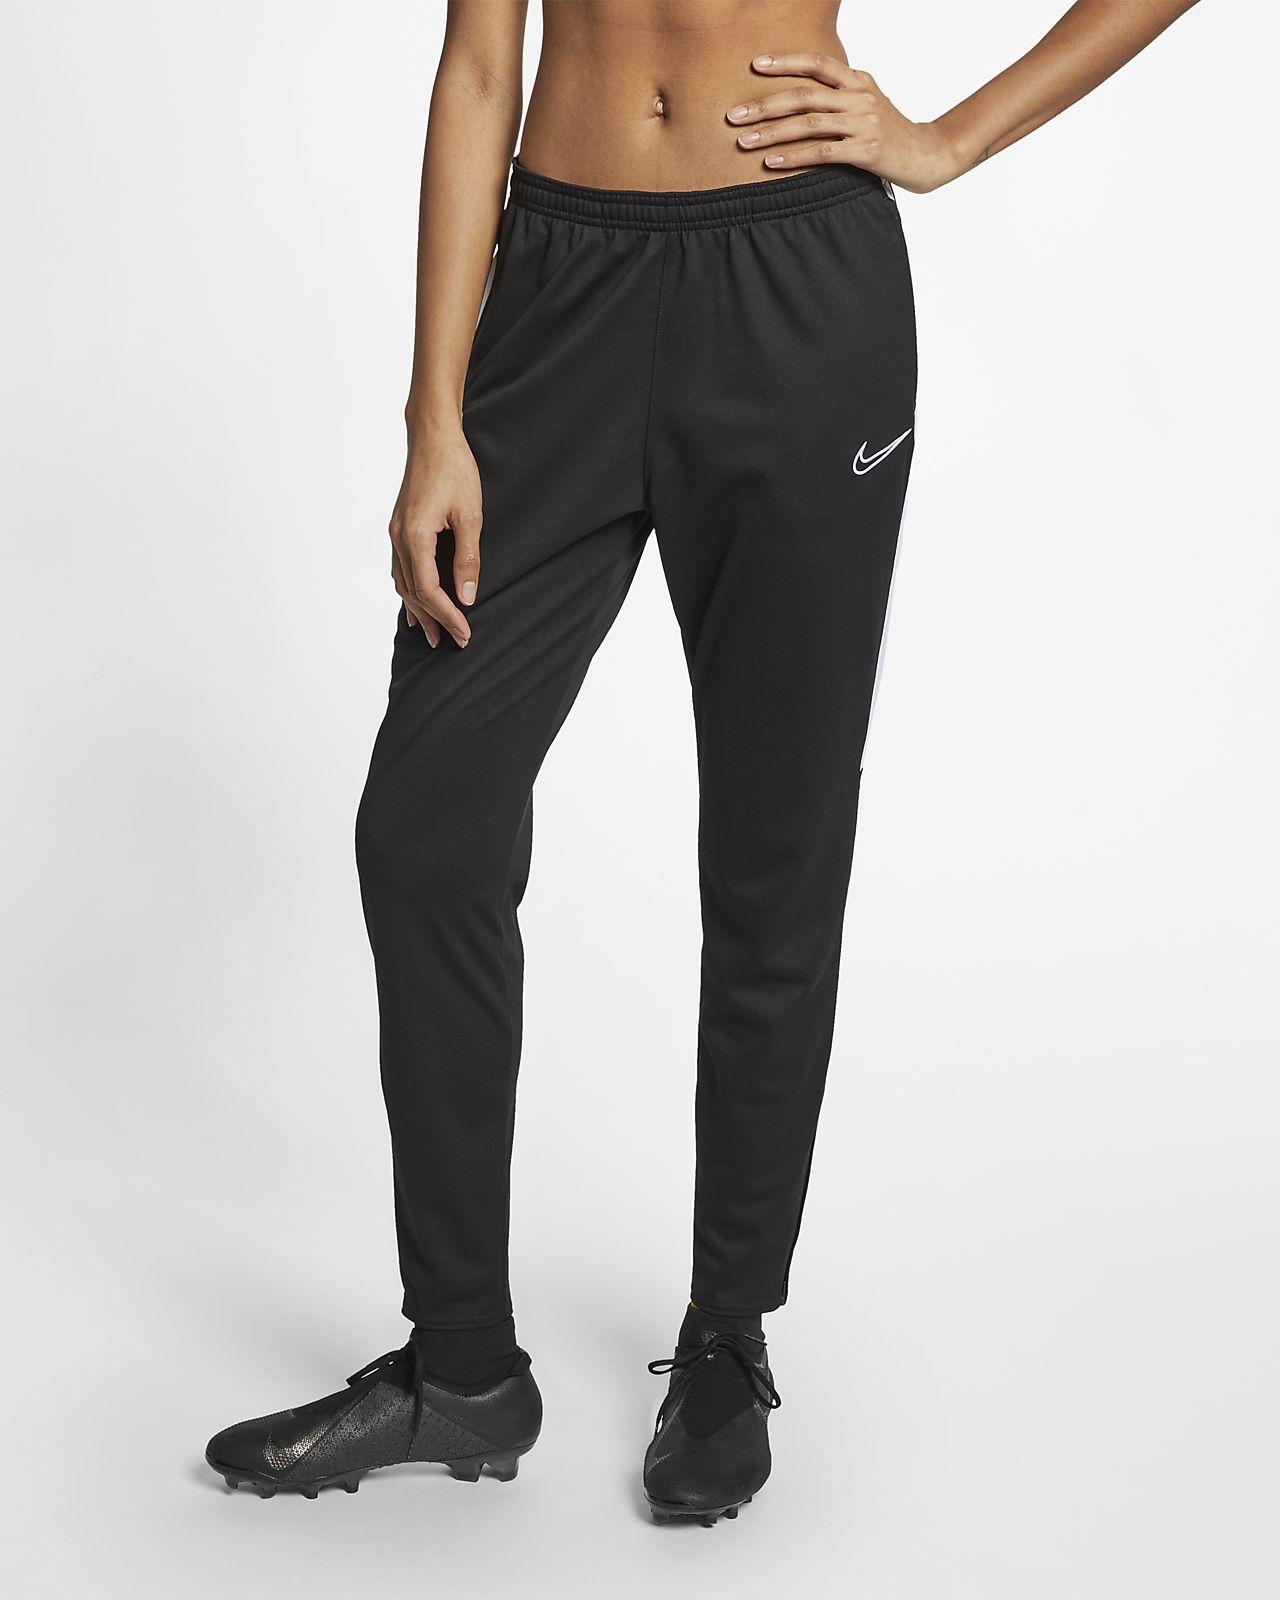 Nike Dri-FIT Academy Pantalón de fútbol - Mujer